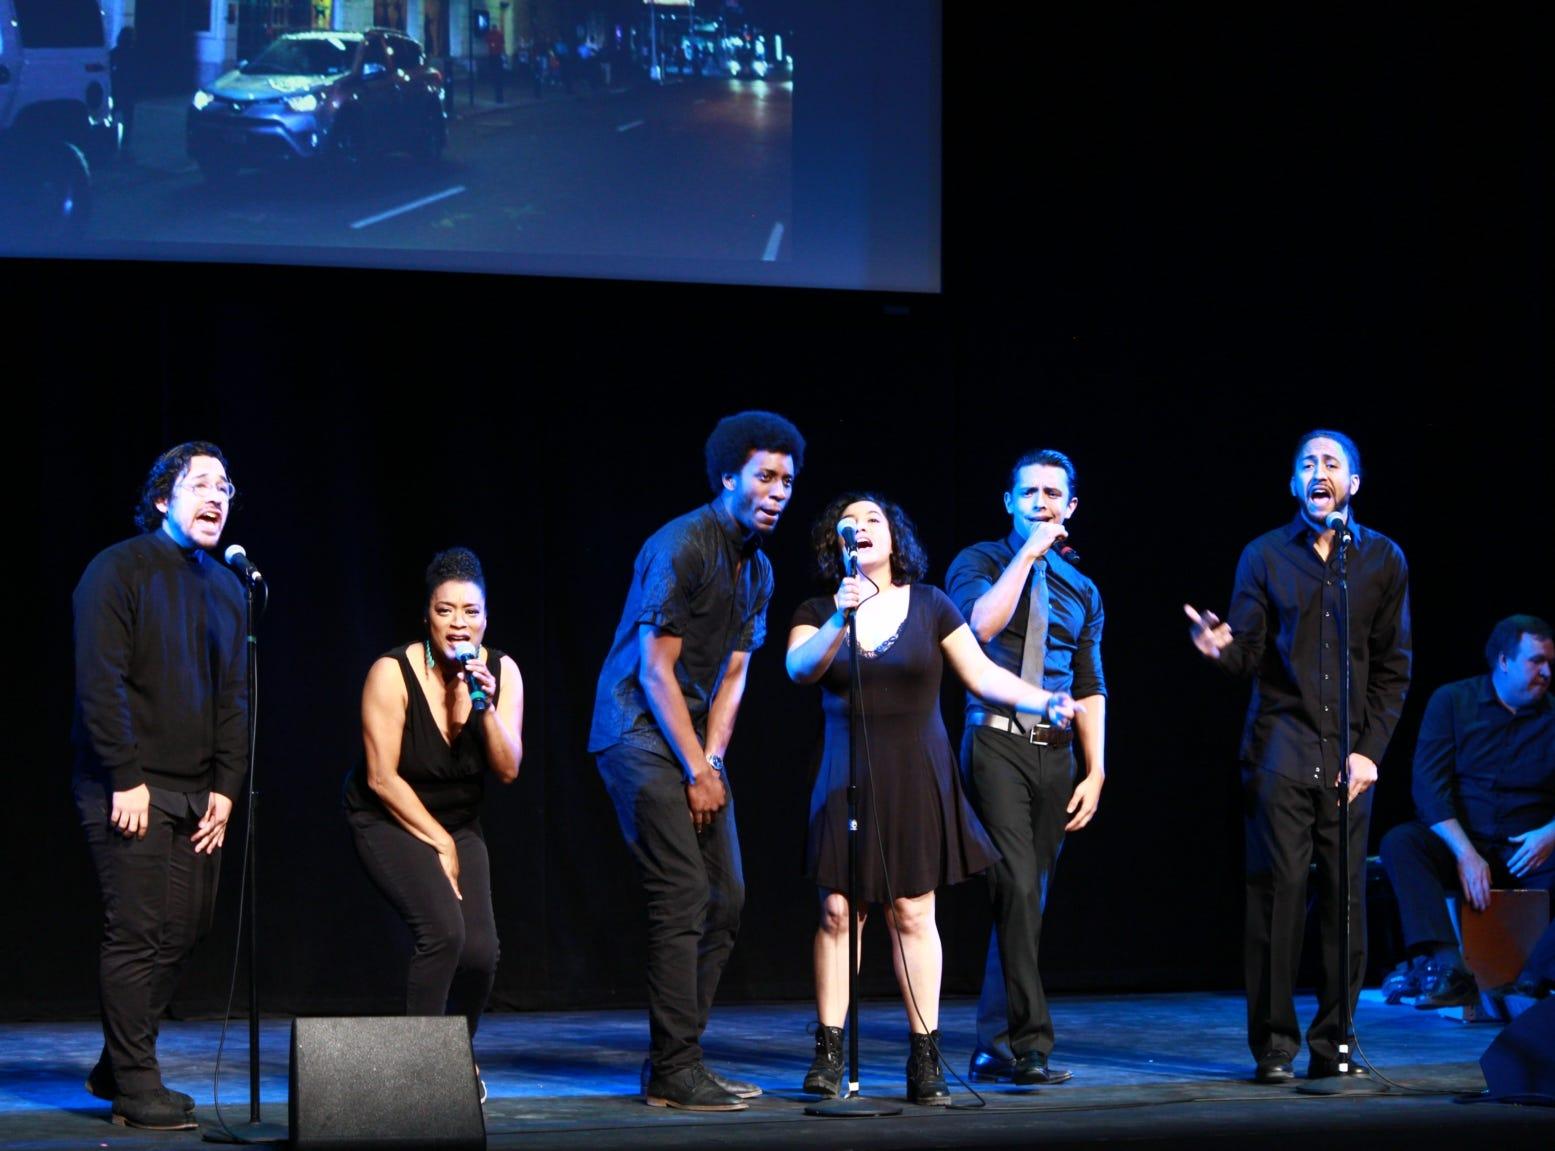 Western New Mexico University to host educational program on Broadway's 'Hamilton'